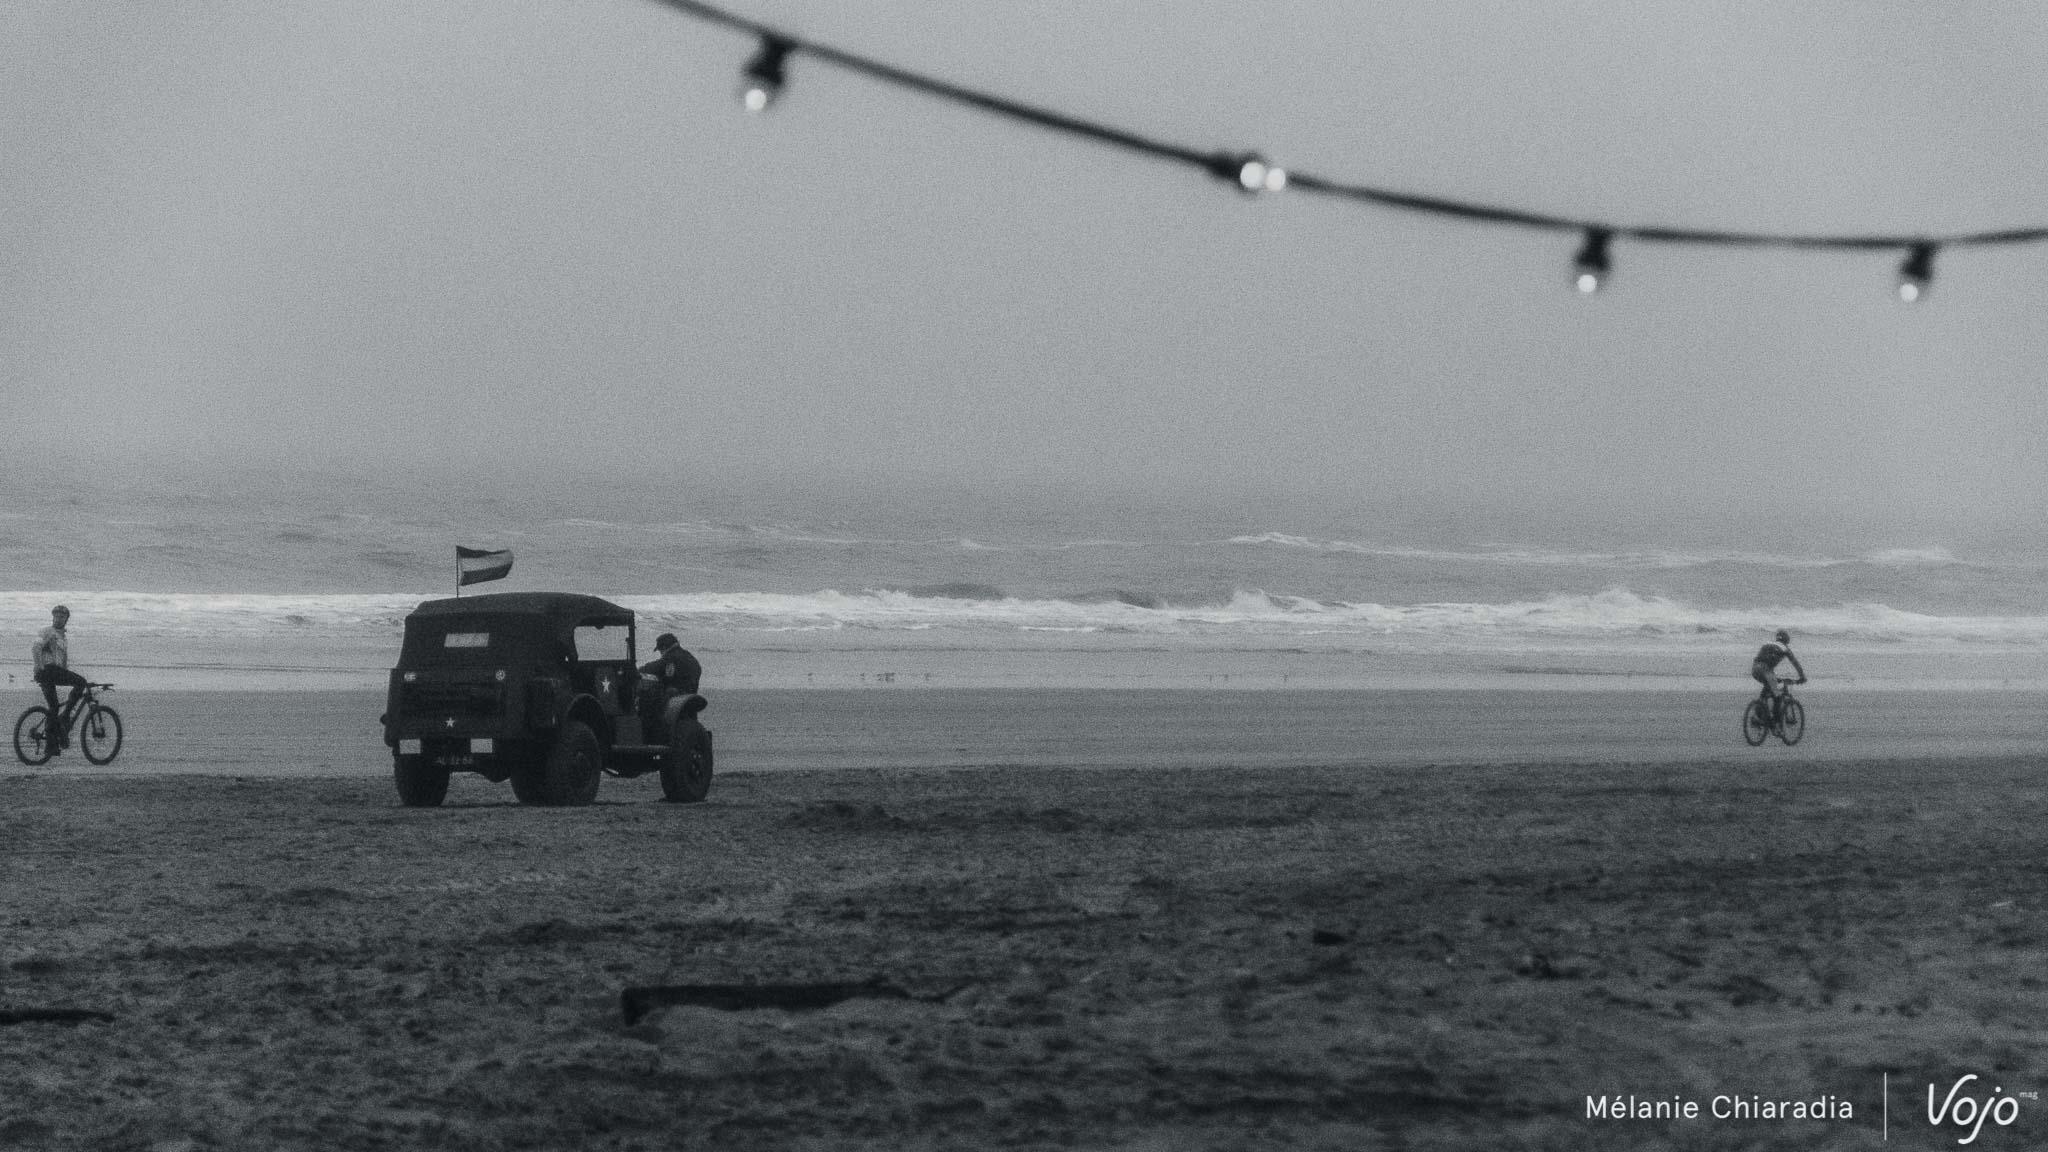 beachrace_egmond_pier_egmond_mel_copyright_obeart_vojomag-39